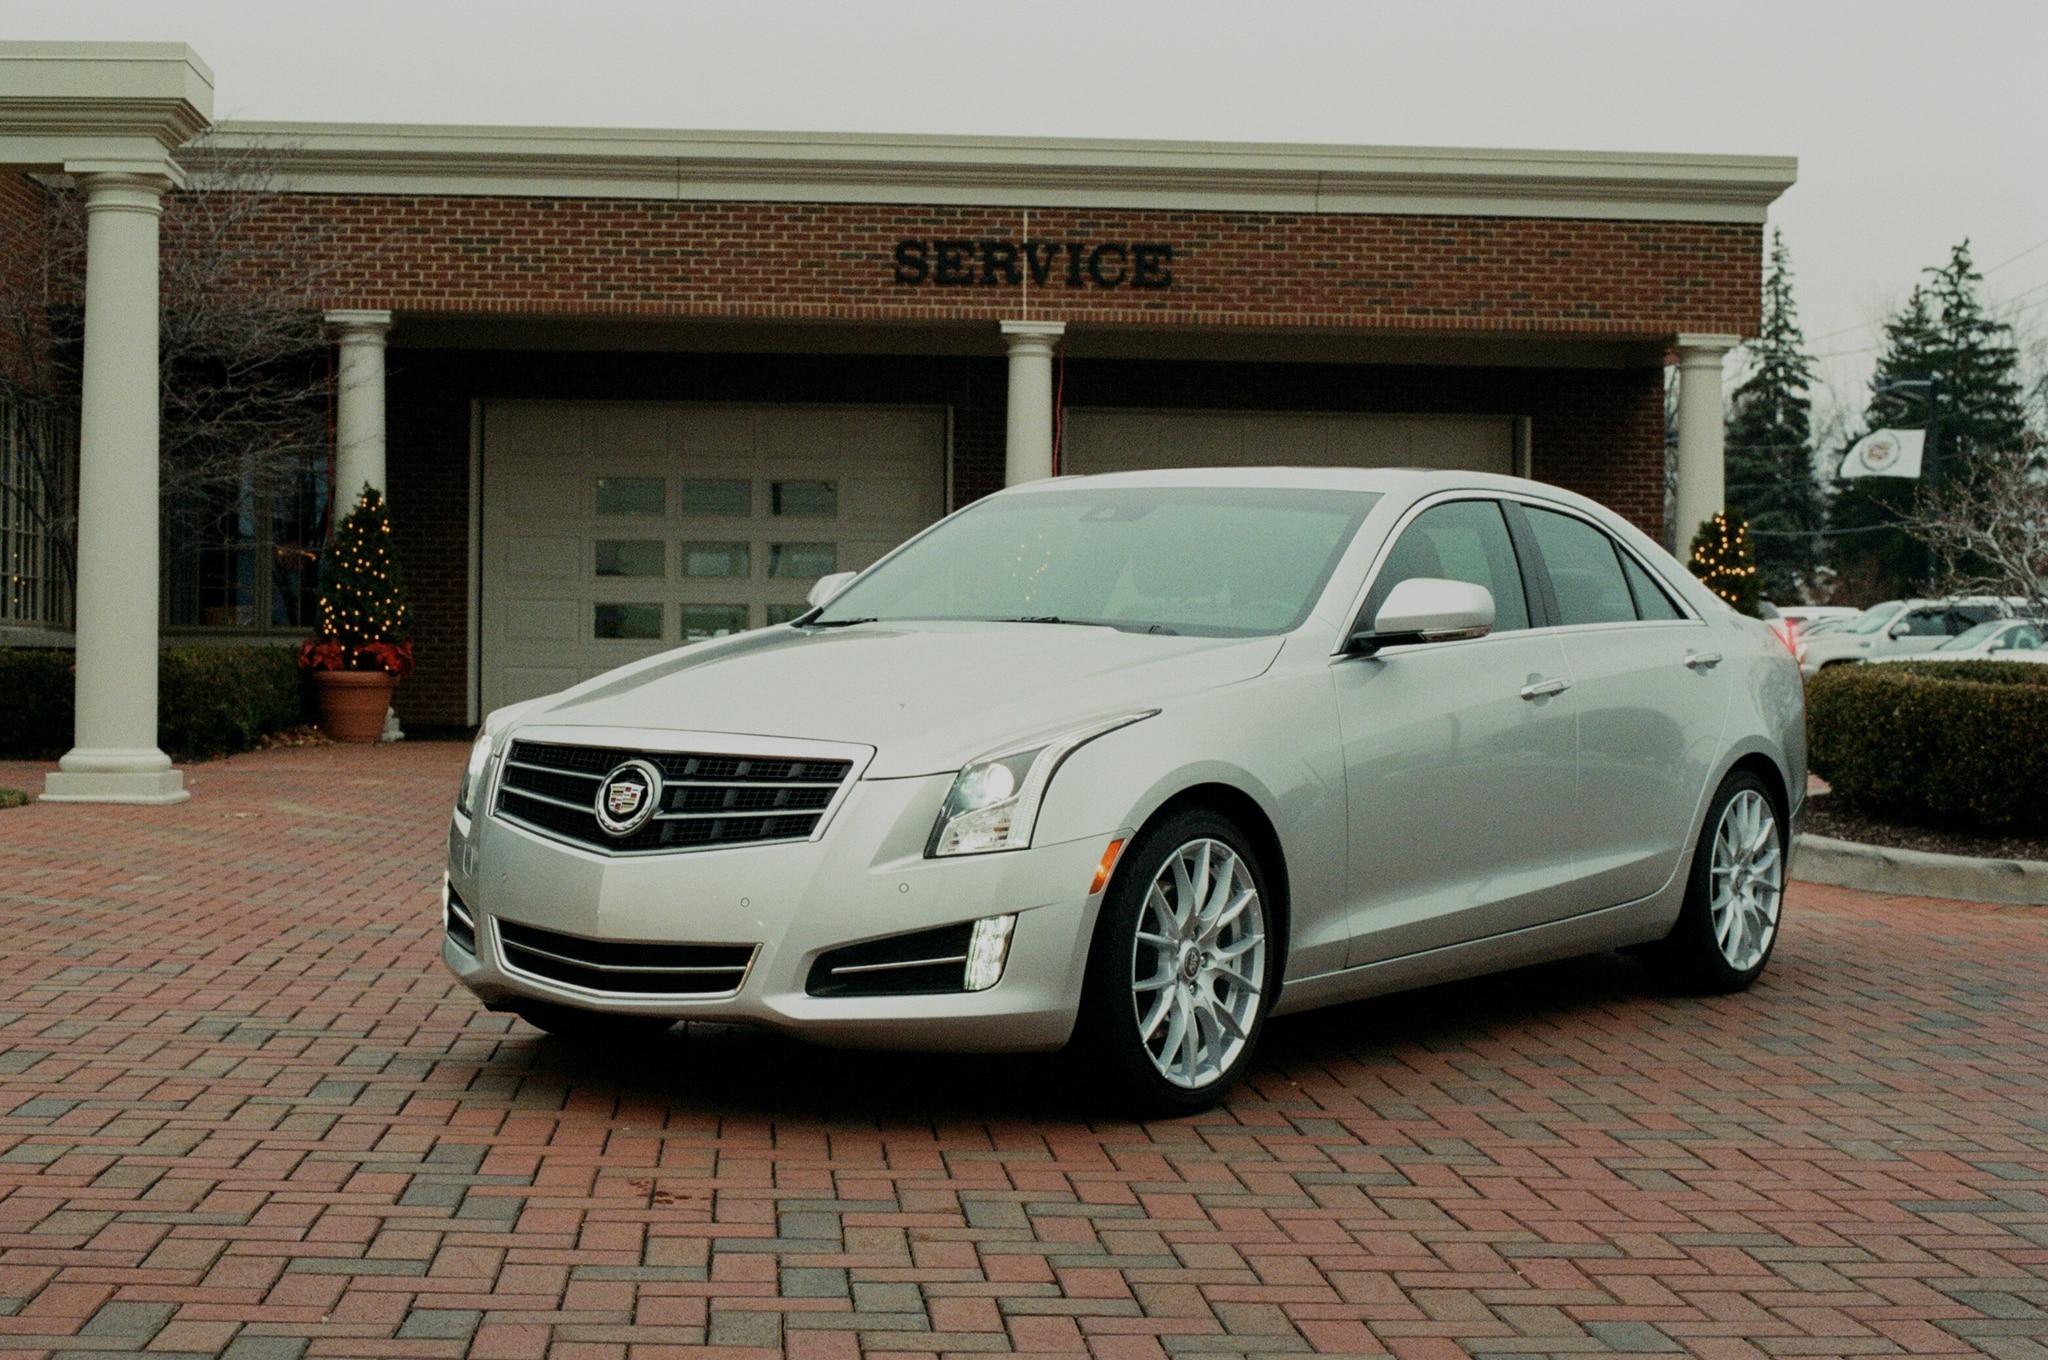 2013 Cadillac Ats Toledo Dealer Service1